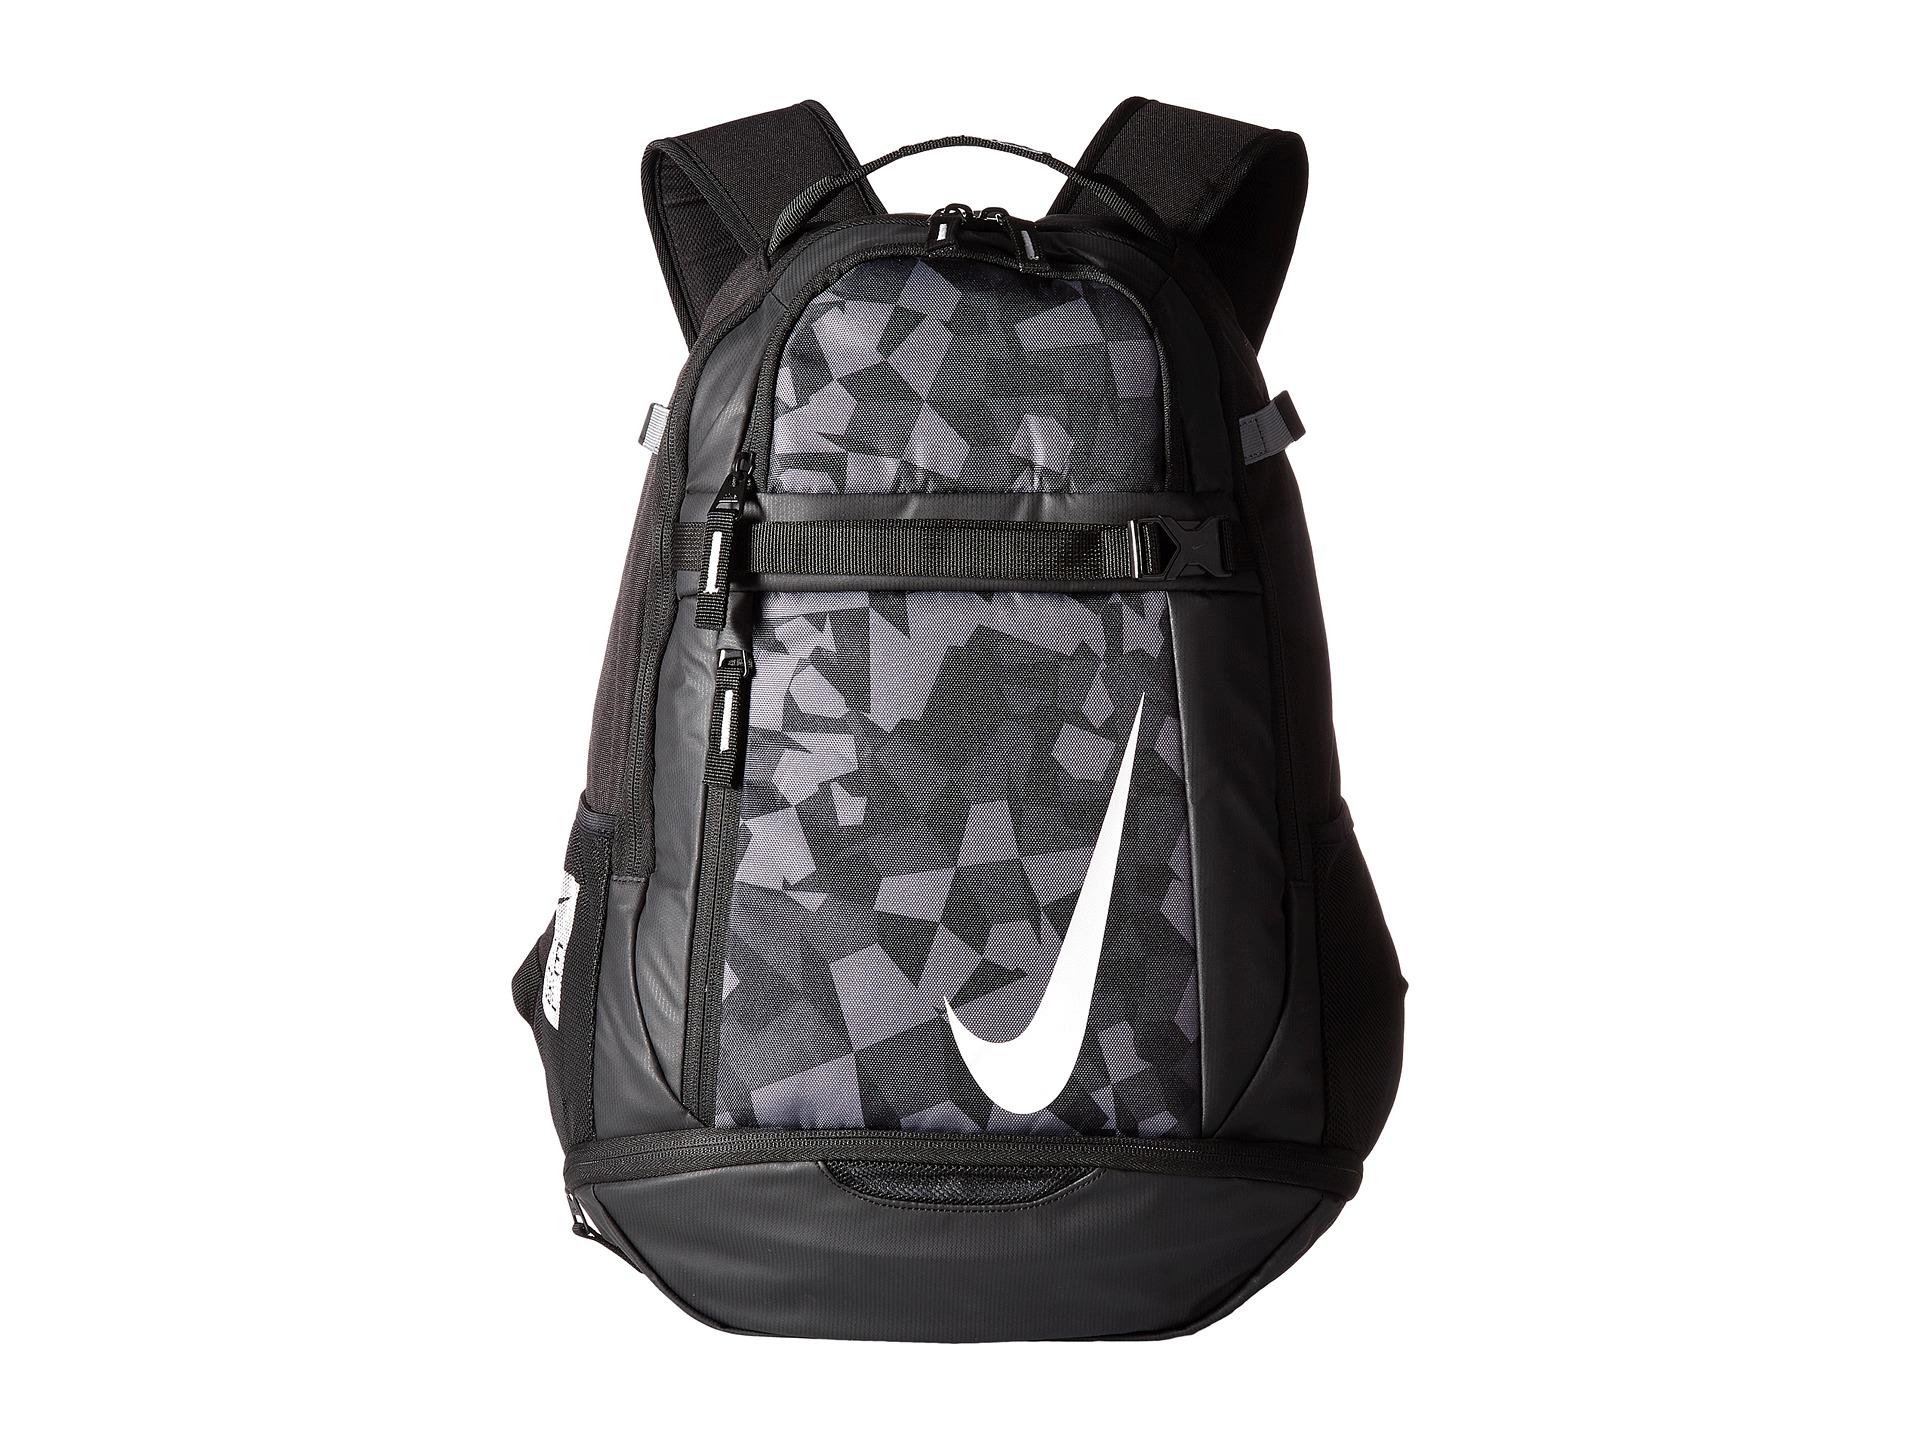 Nike Vapor Select 2.0 Graphic Baseball Backpack at Zappos.com